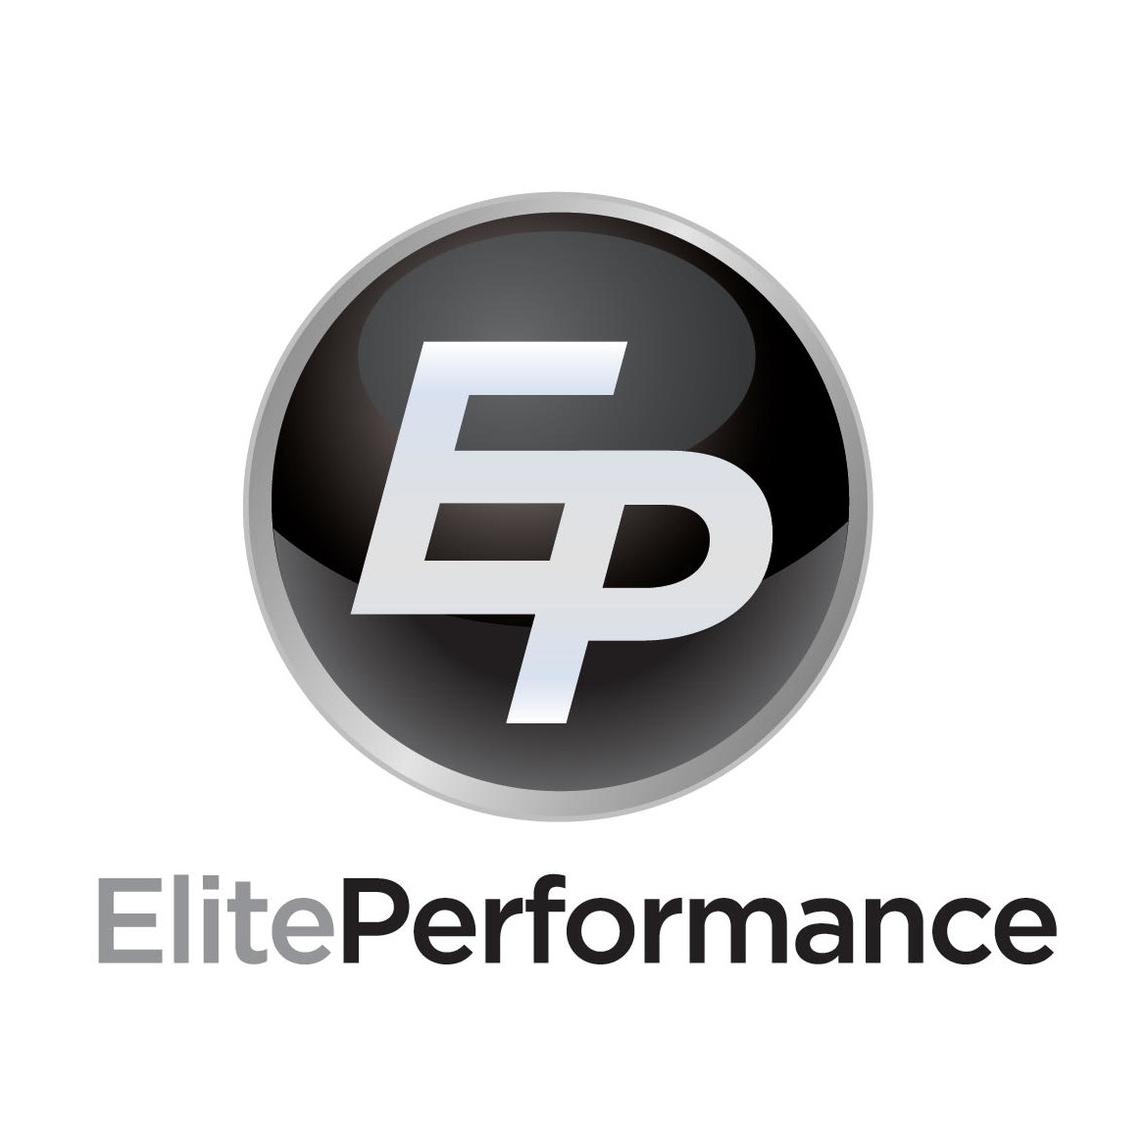 Elite PERFORMANCE  Website: Epfitness.ca  Facebook::  @eliteperformancevancouver  Instagram:  @epfitnessca  Twitte r: @epfitnessca